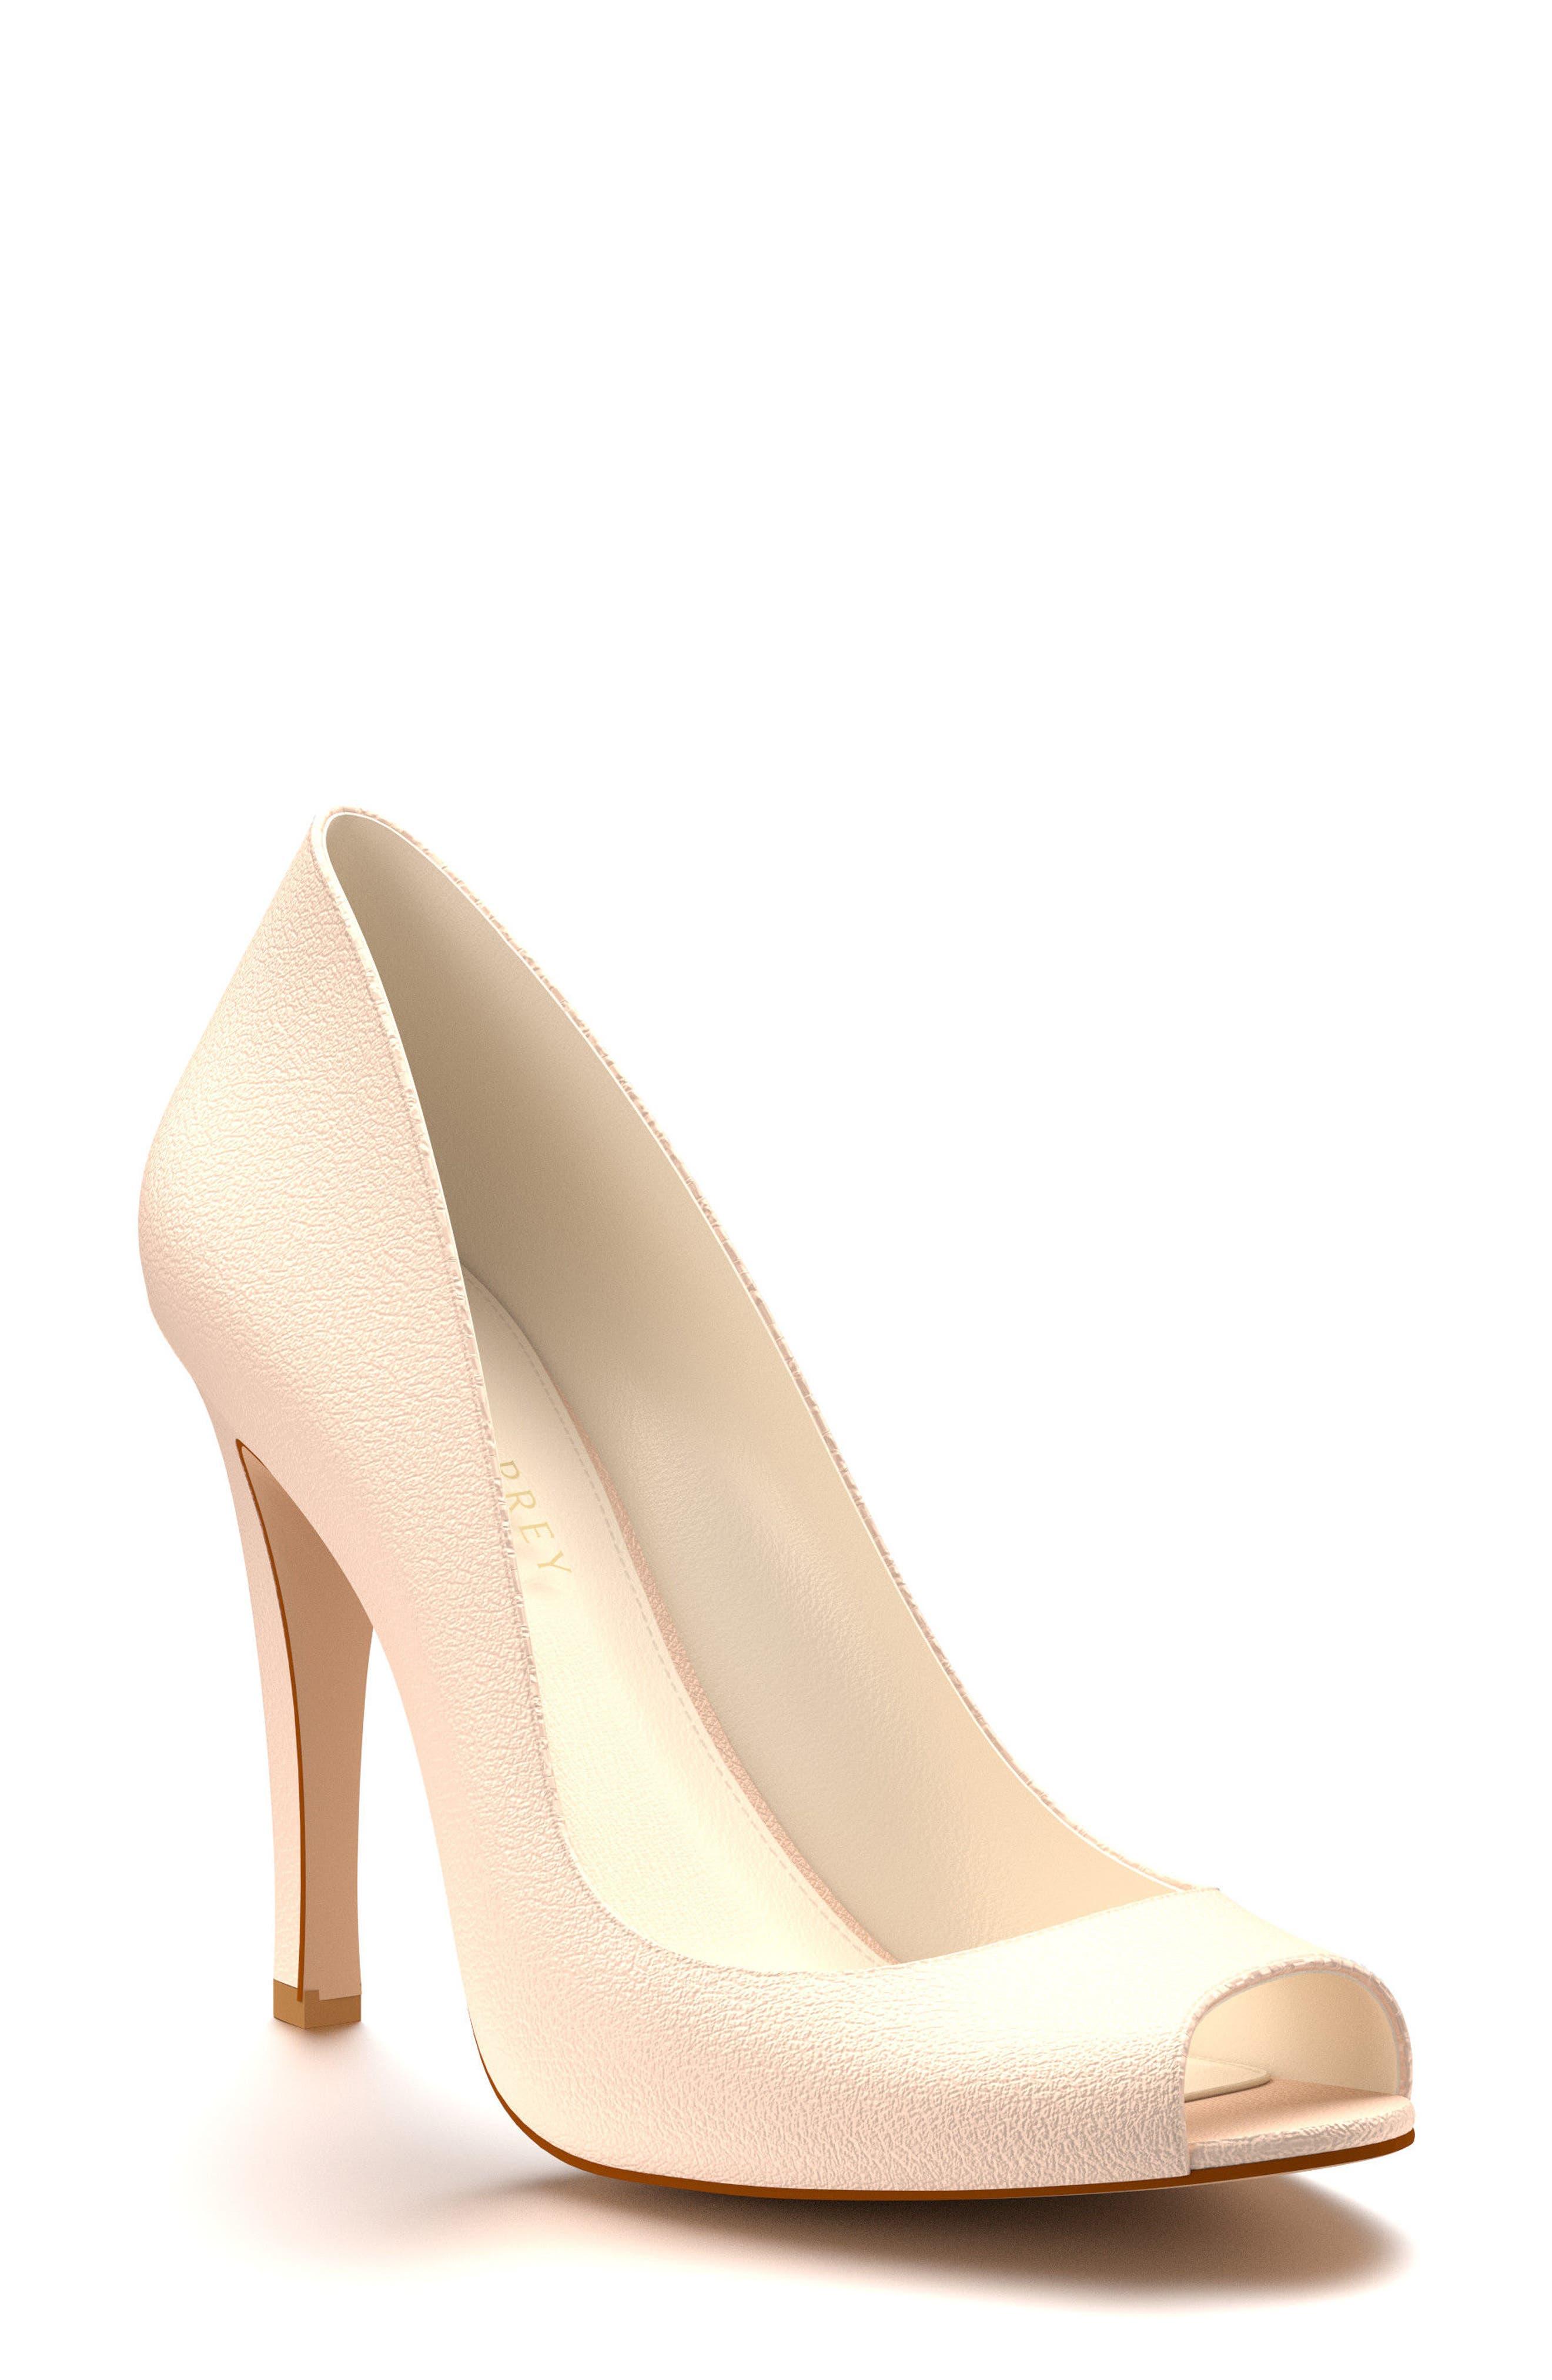 Alternate Image 1 Selected - Shoes of Prey Peep Toe Pump (Women)